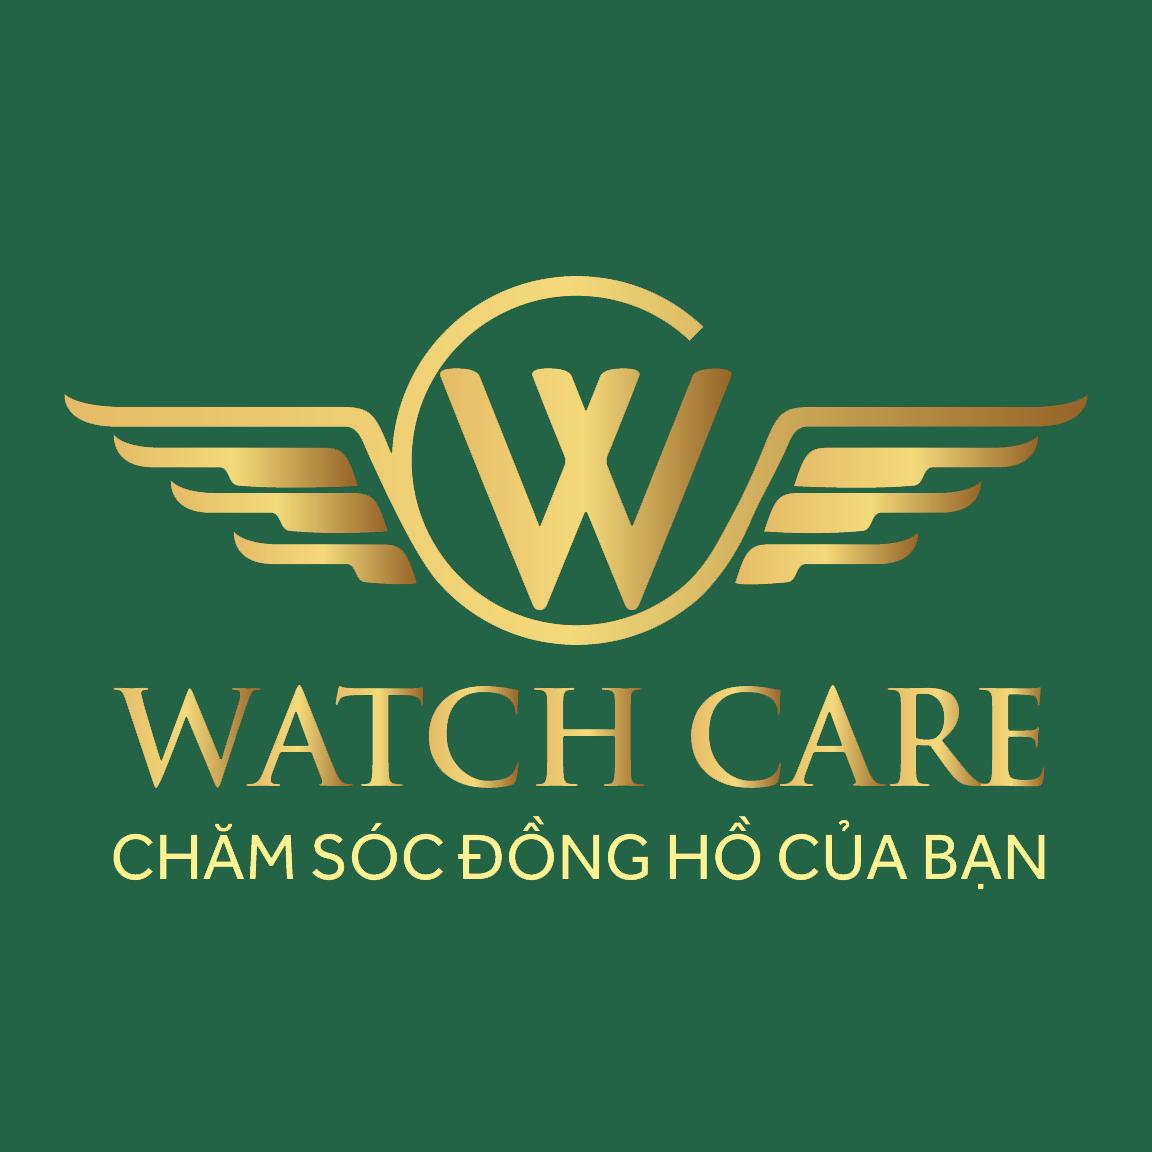 Sửa chữa đồng hồ Watchcare.vn Watchrepair Workshop Watchcare.vn